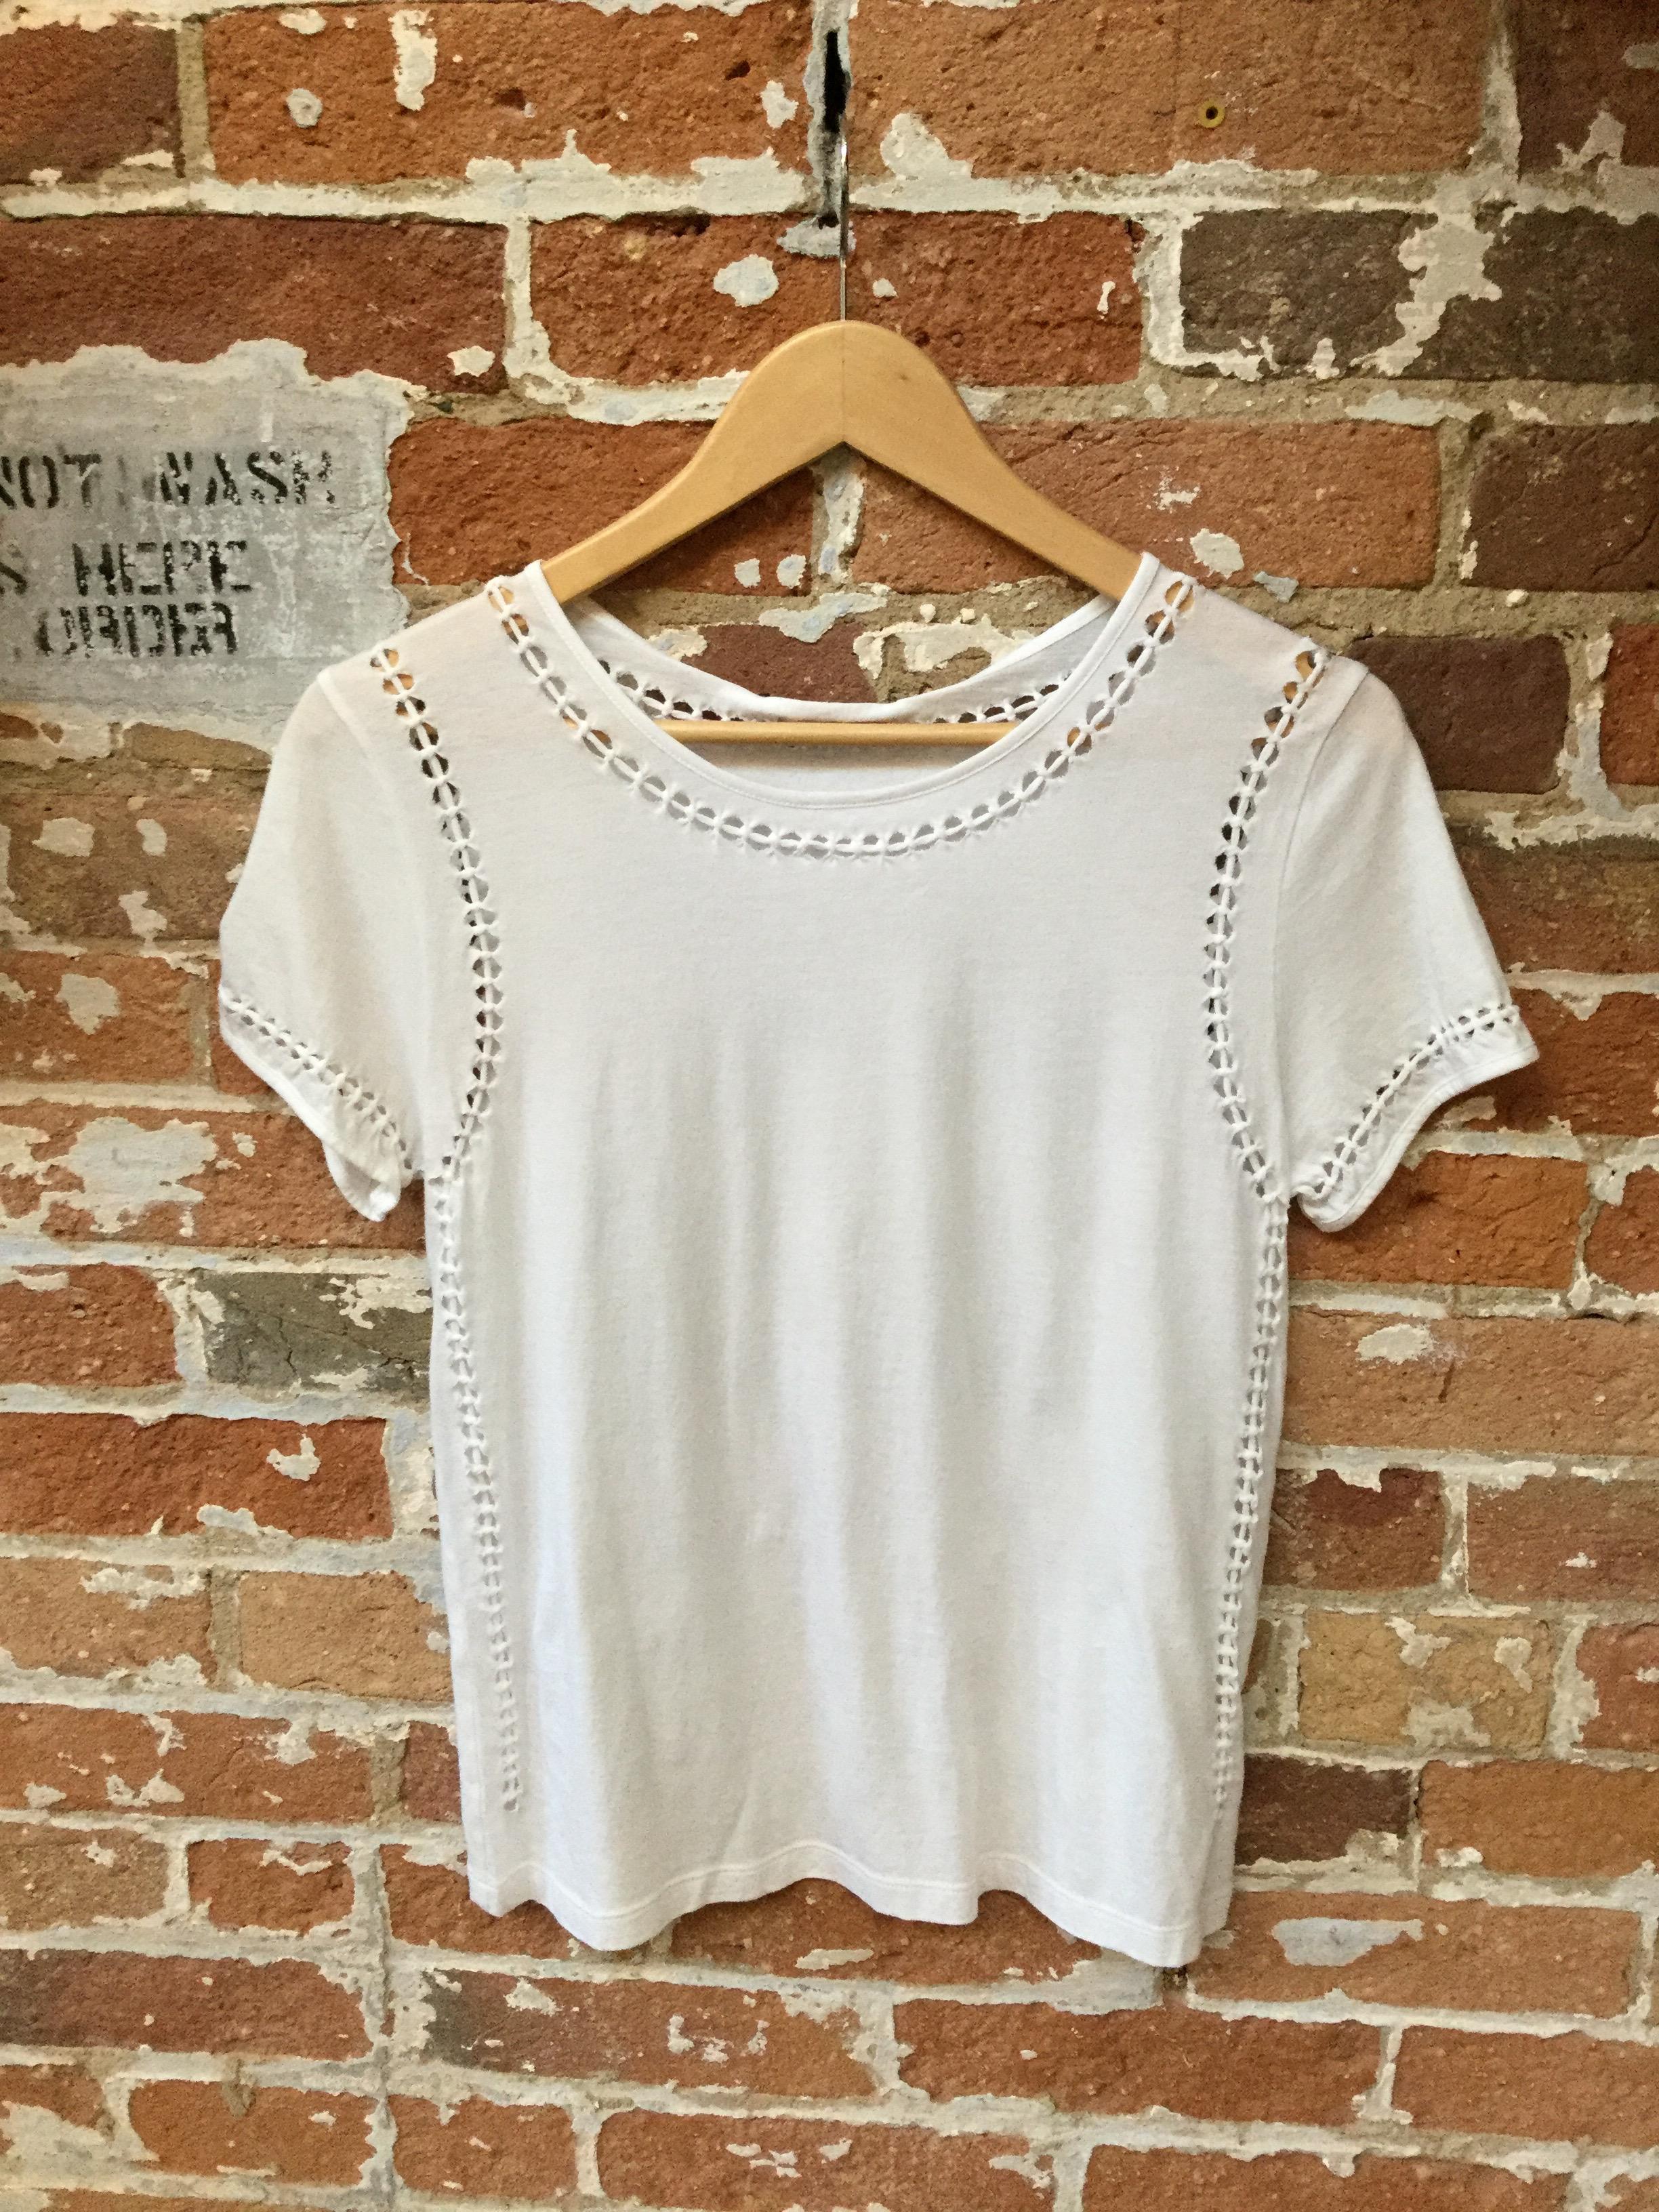 Generation Love t-shirt $198